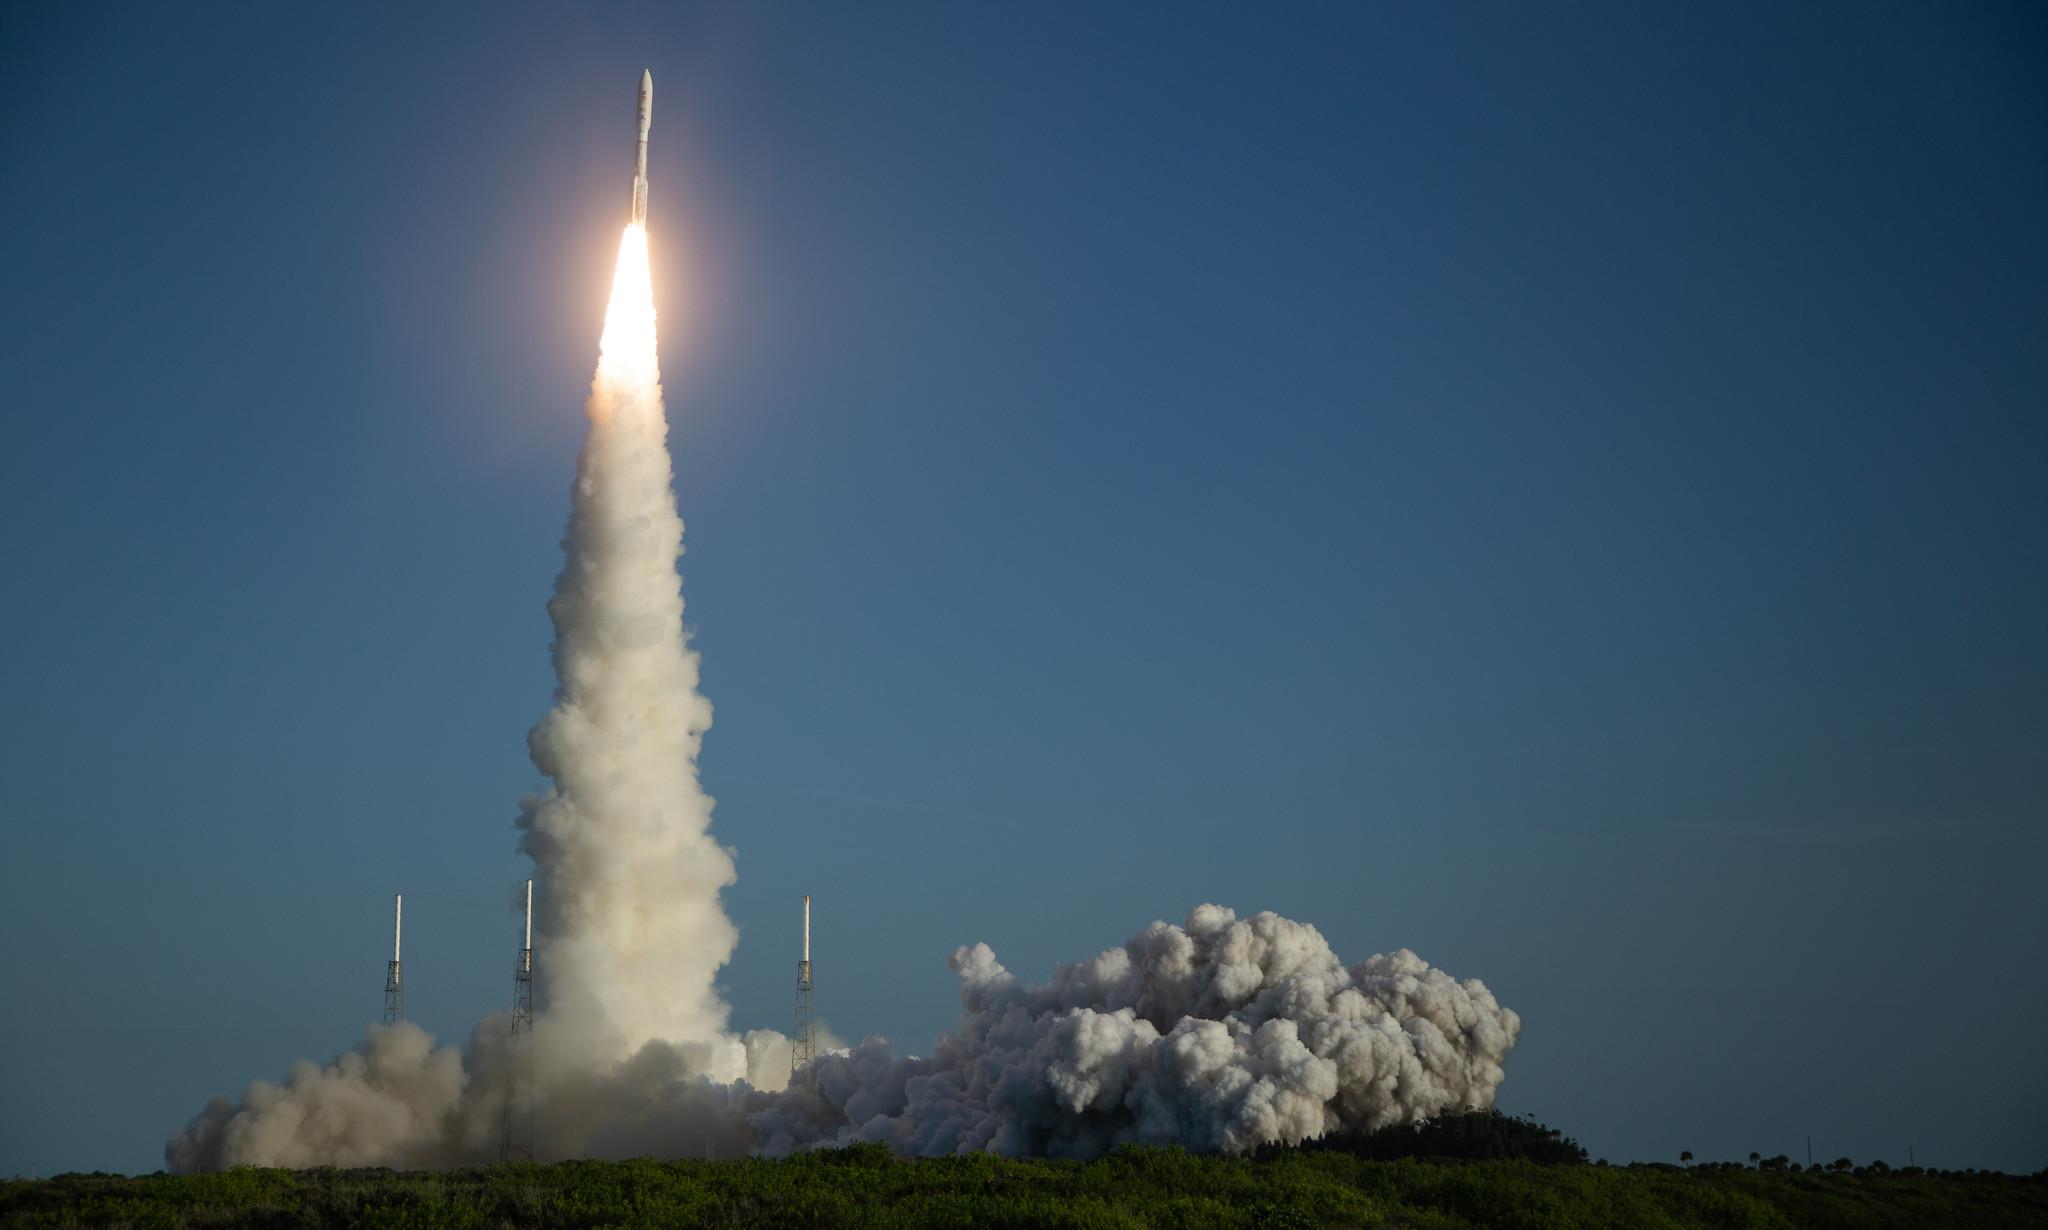 NASA, ULA Launch Mars 2020 Perseverance Rover Mission to ...